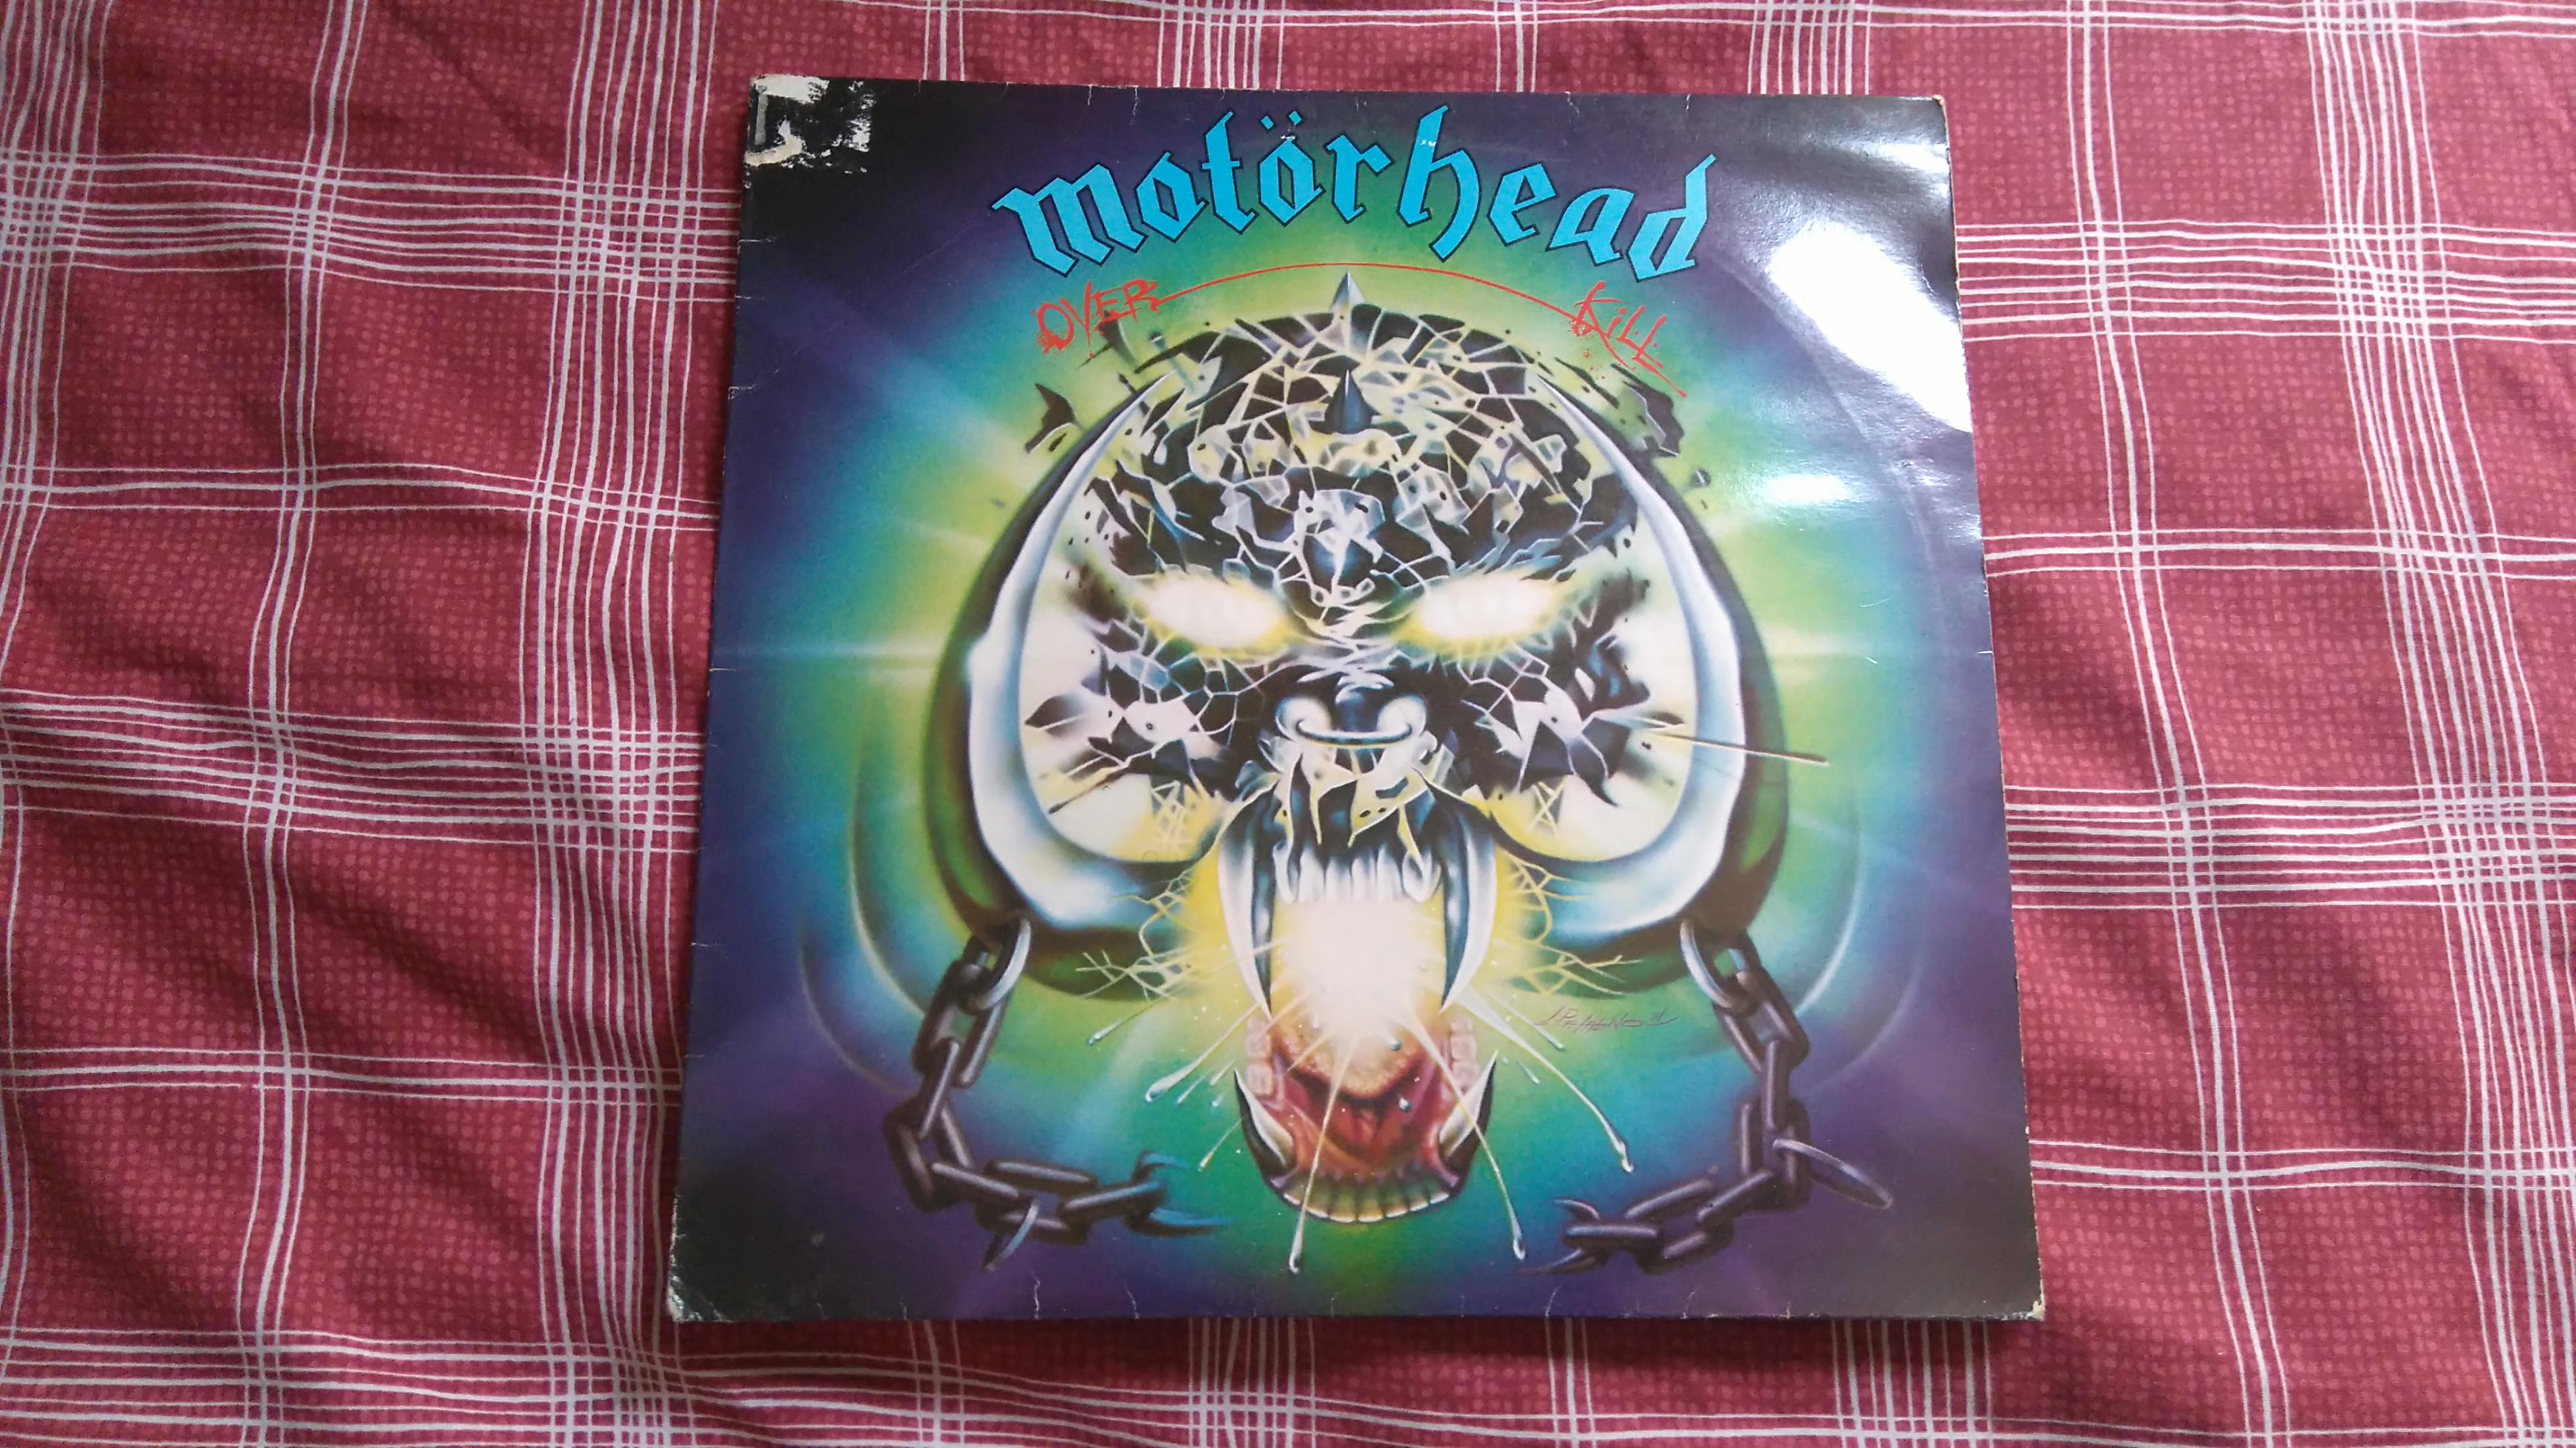 Motorhead Vinyl.JPG